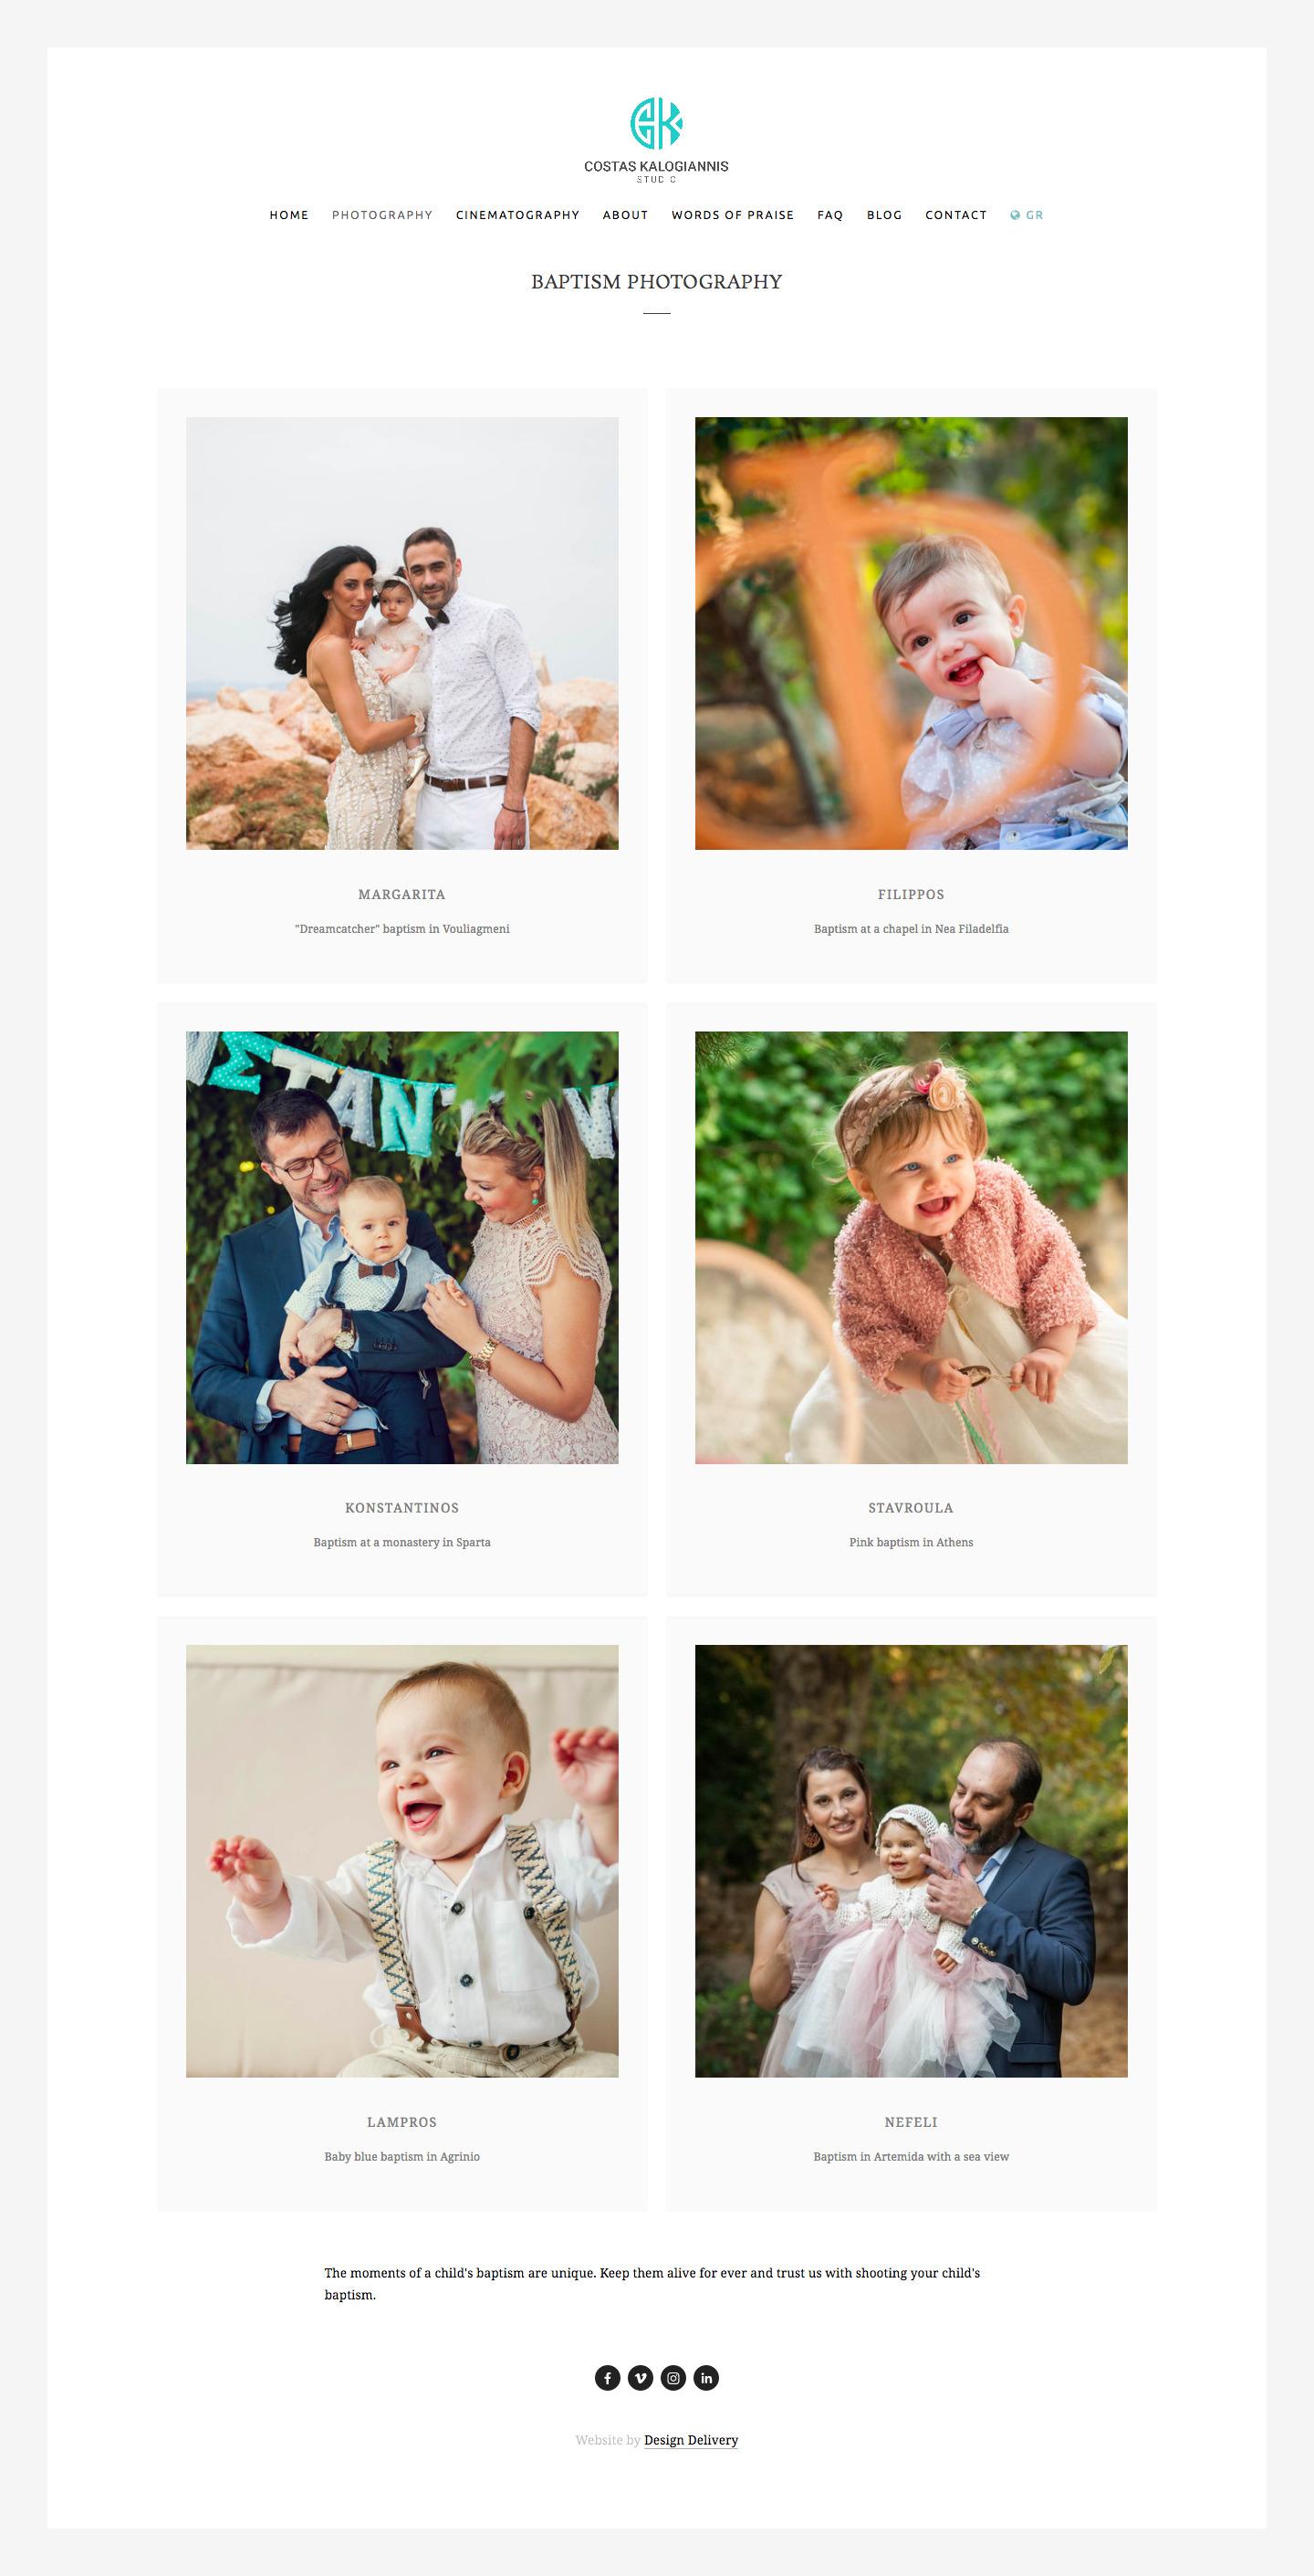 Screenshot_2018-12-21 BAPTISM PHOTOGRAPHY — K Studio Kostas Kalogiannis.jpg